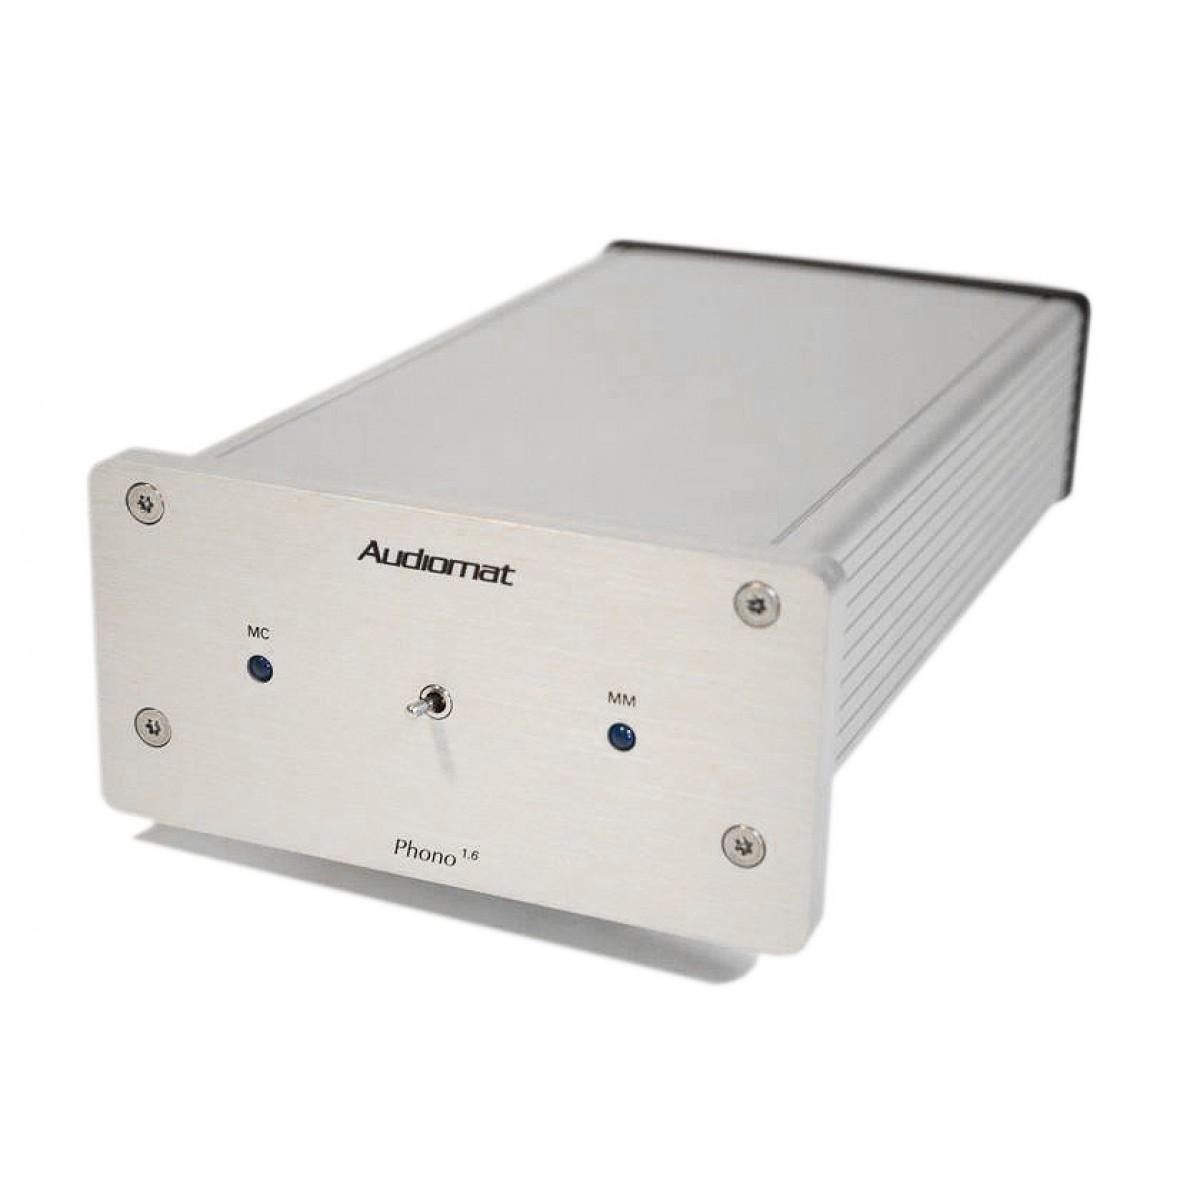 Audiomat Phono 1.6